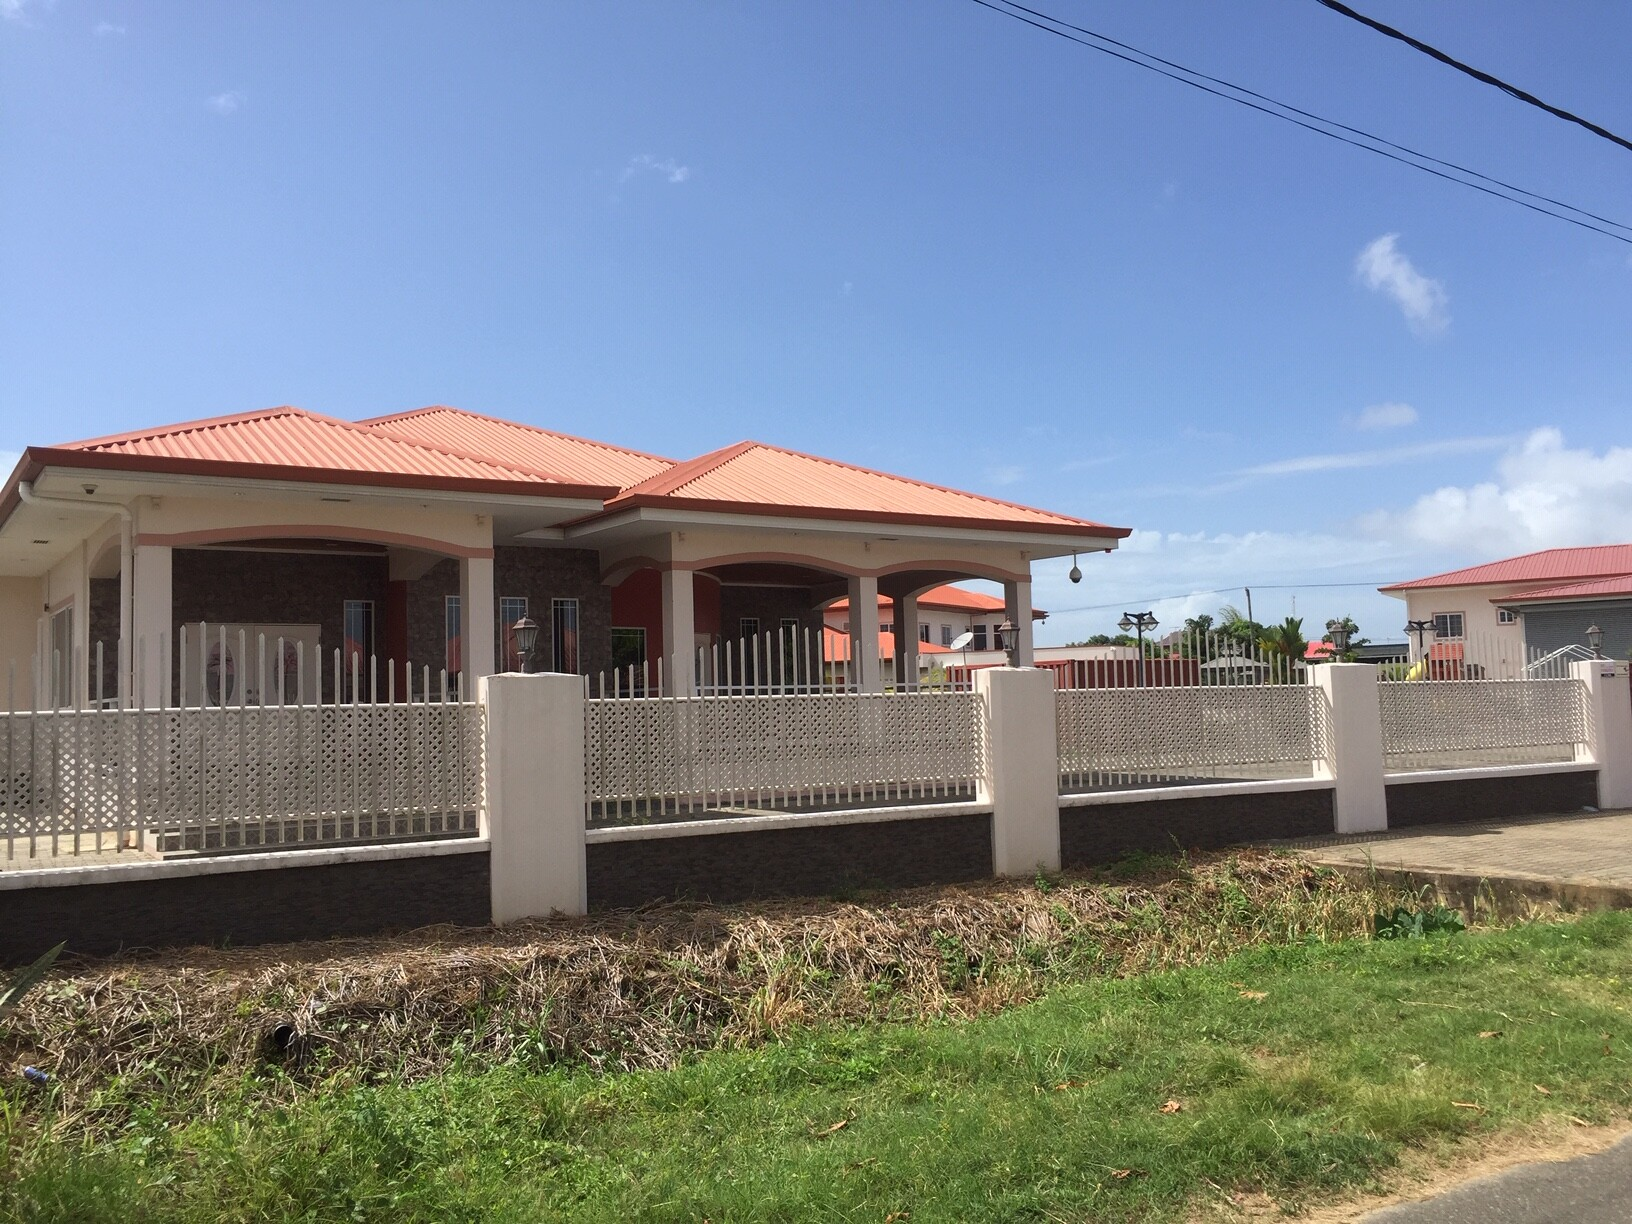 Osembolaan 6 - Ruime woning te Uitvlugt - Surgoed Makelaardij NV - Paramaribo, Suriname